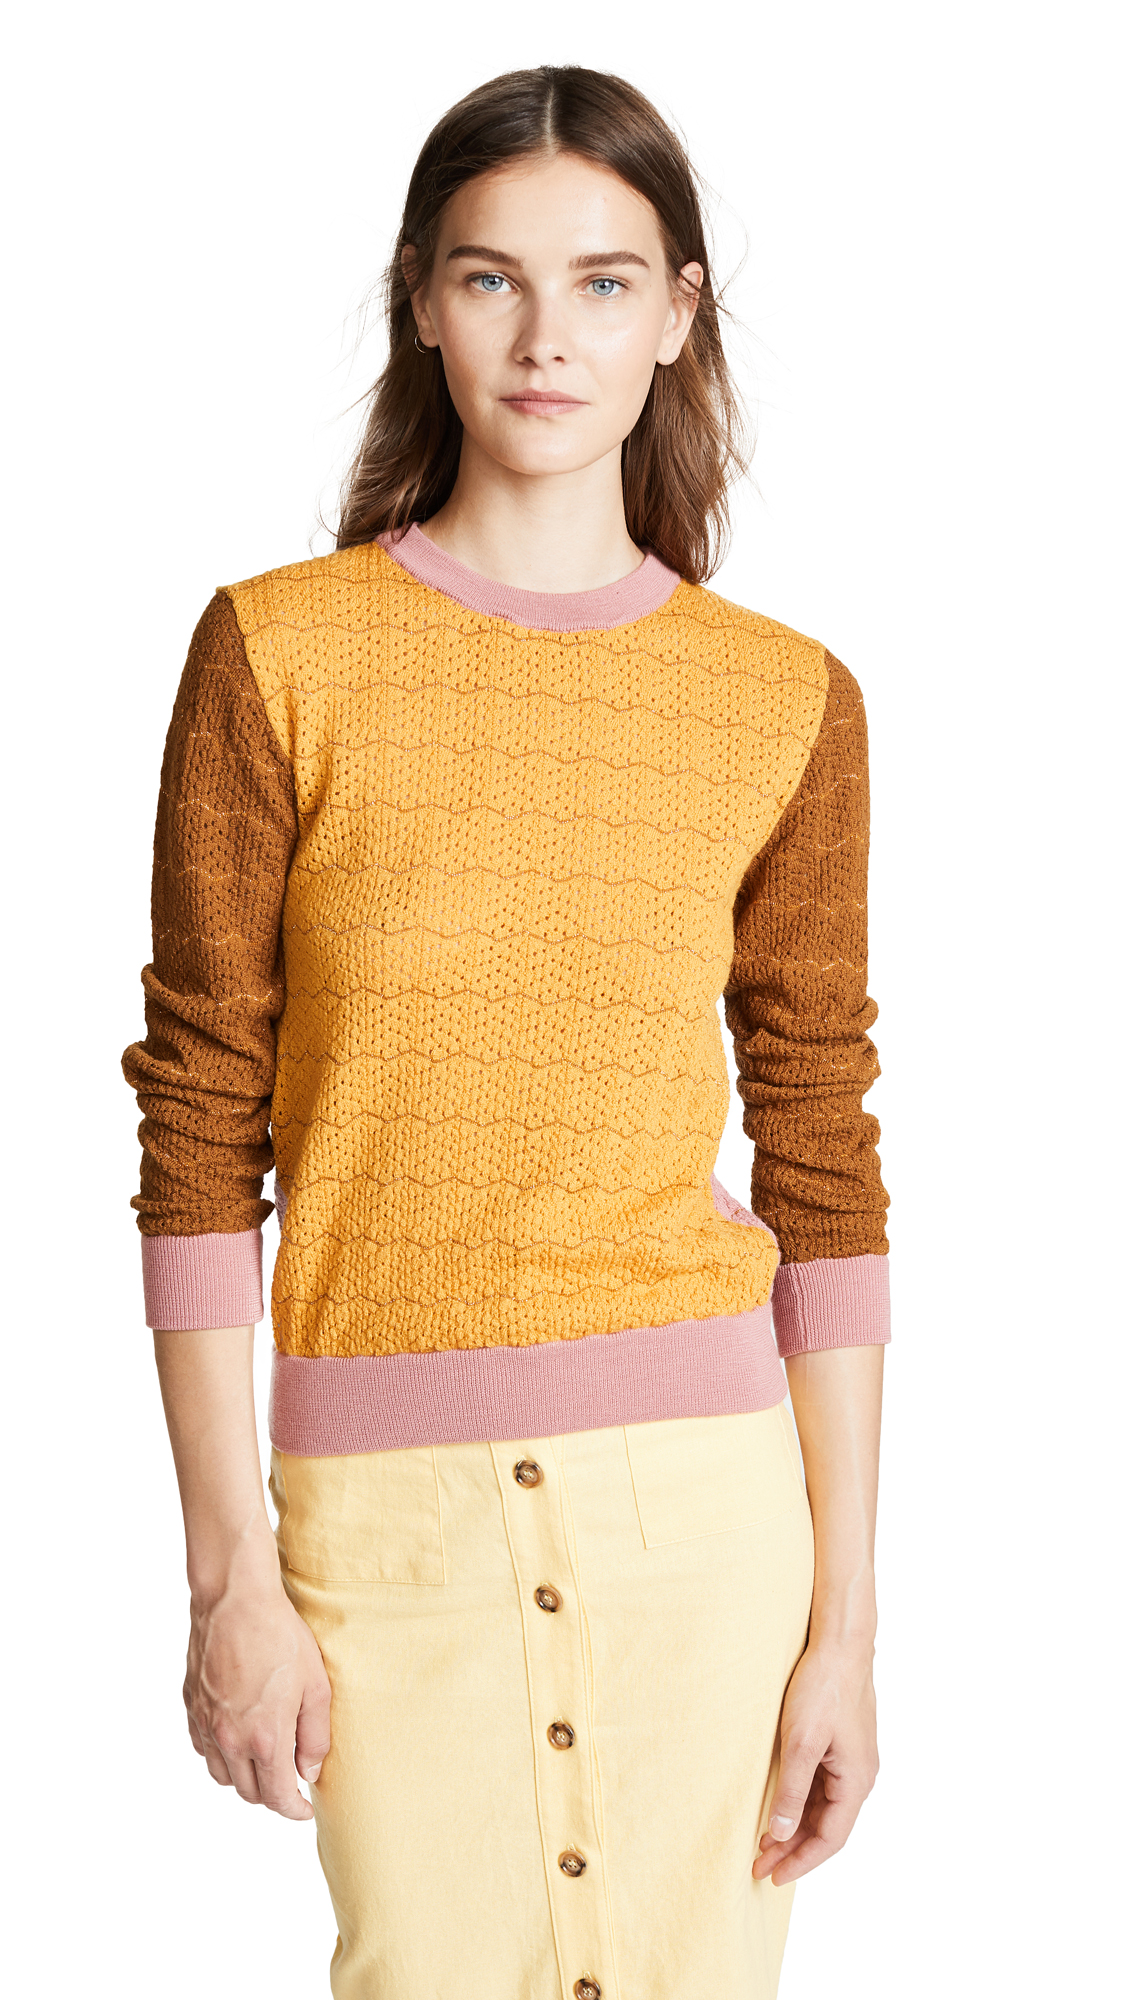 STINE GOYA Naamah Knit Colorblock Sweater in Brown